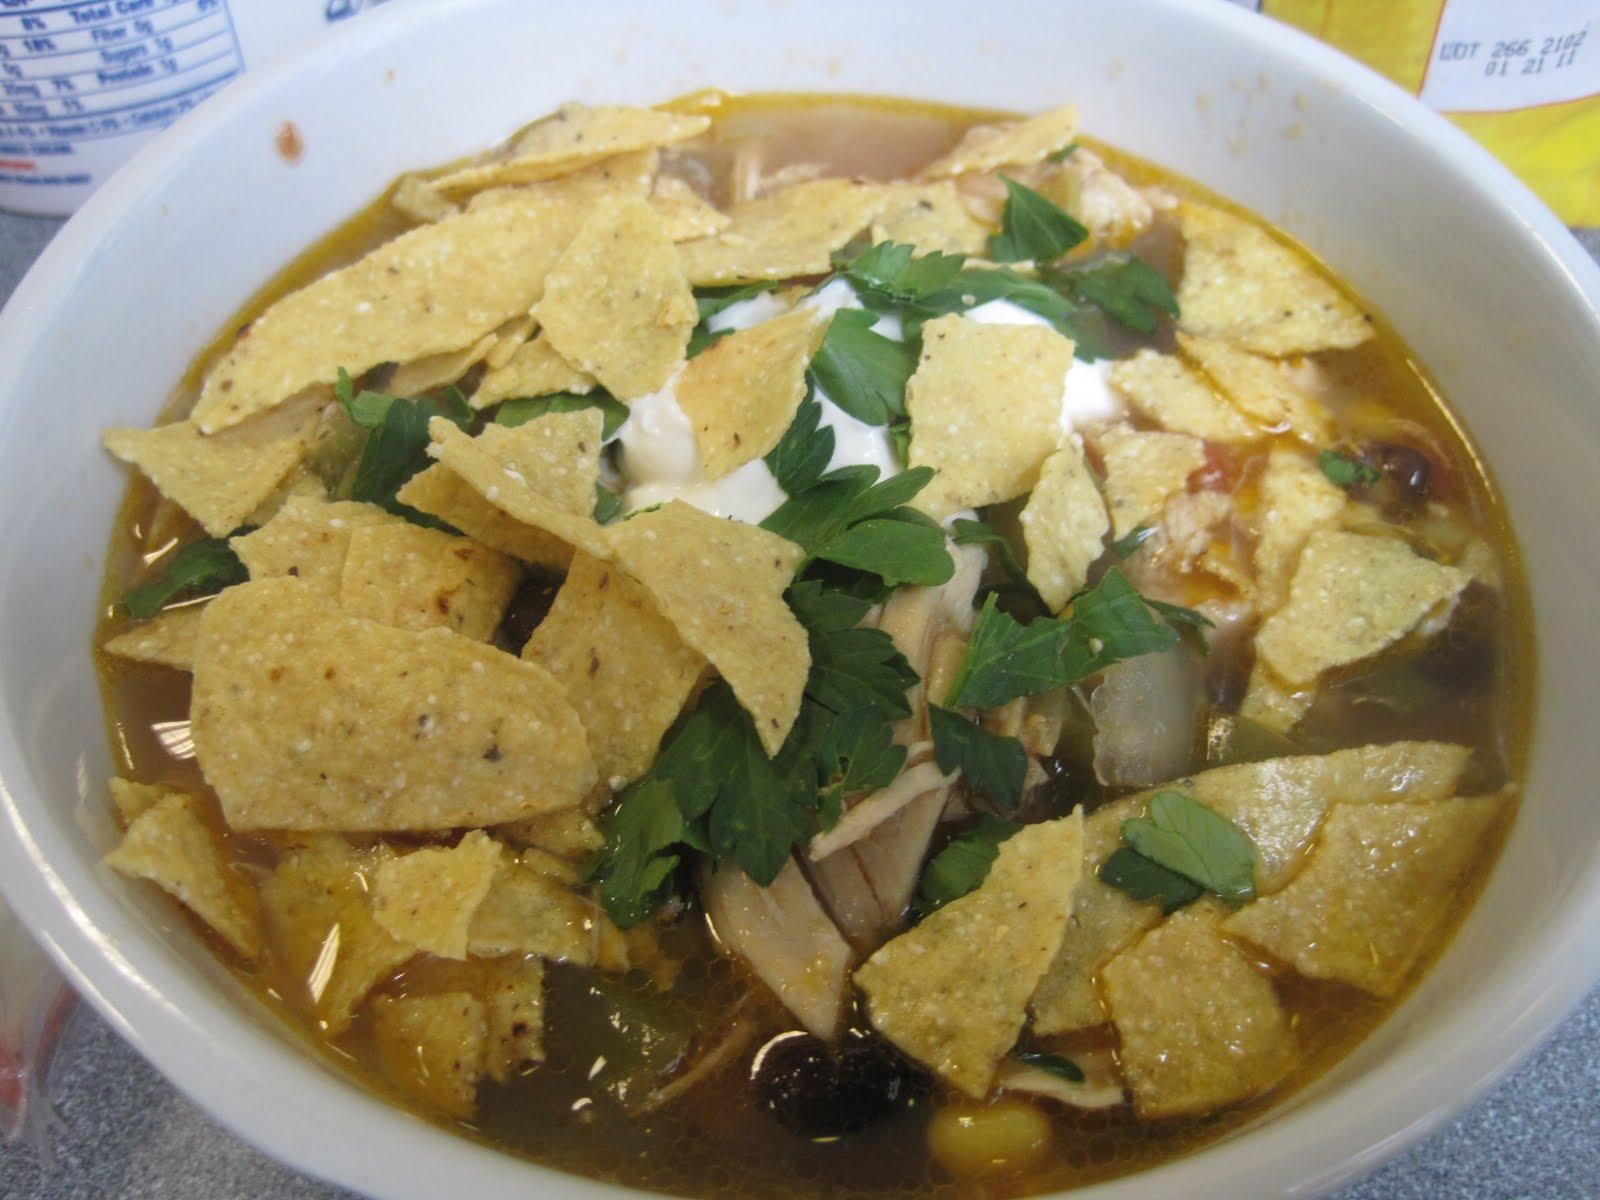 Corcoran Street KitchenChicken Tortilla Soup